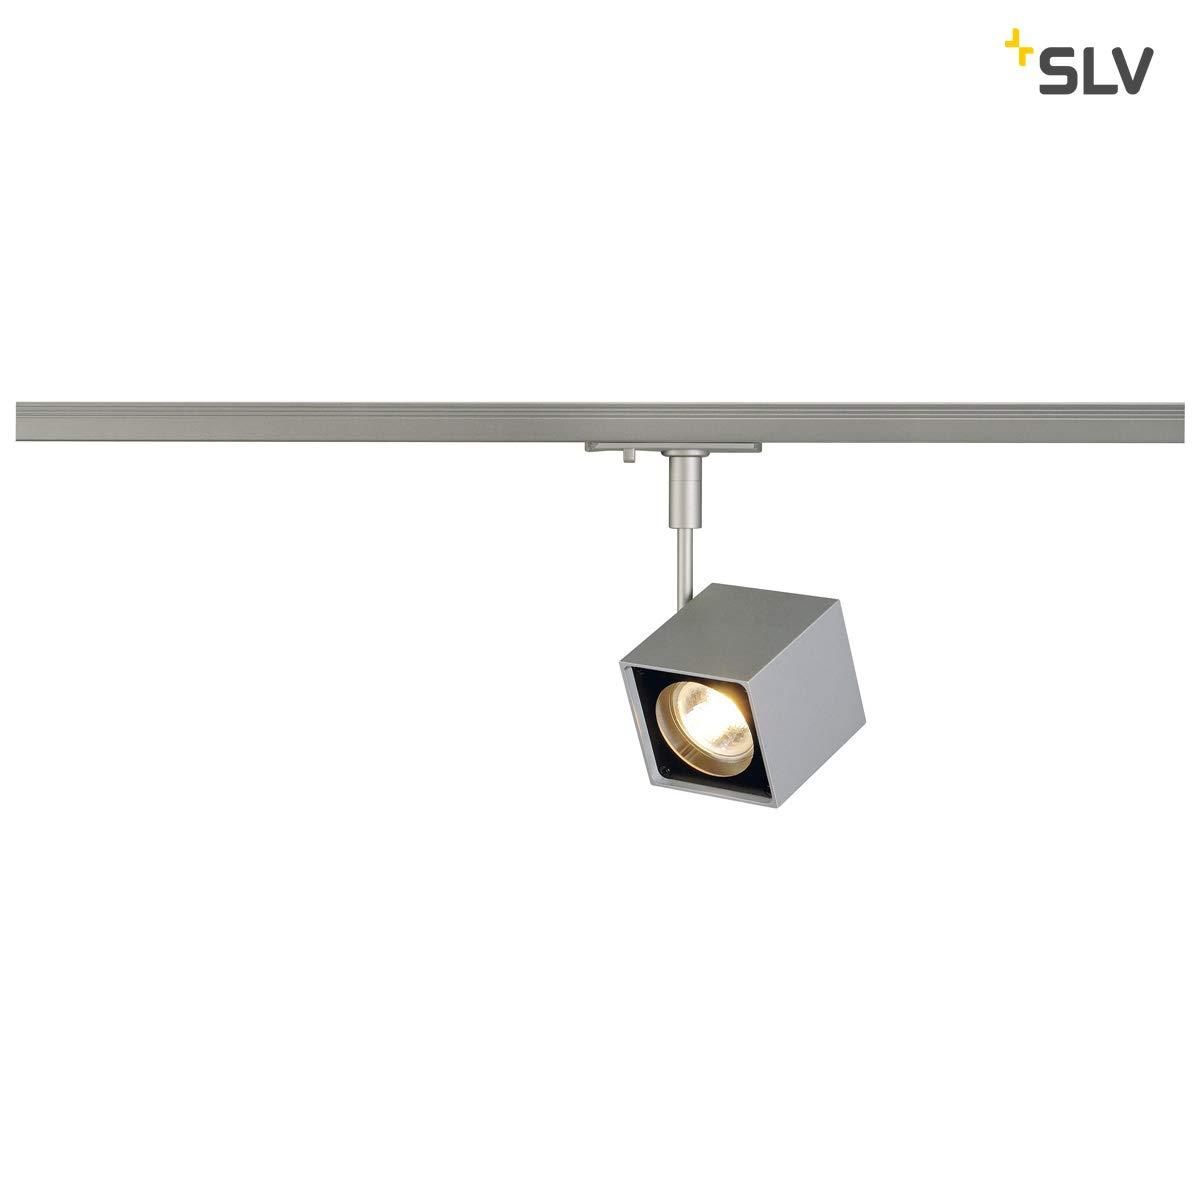 SLV ALTRA DICE Leuchte Indoor-Lampe Aluminium Silber Lampe innen, Innen-Lampe